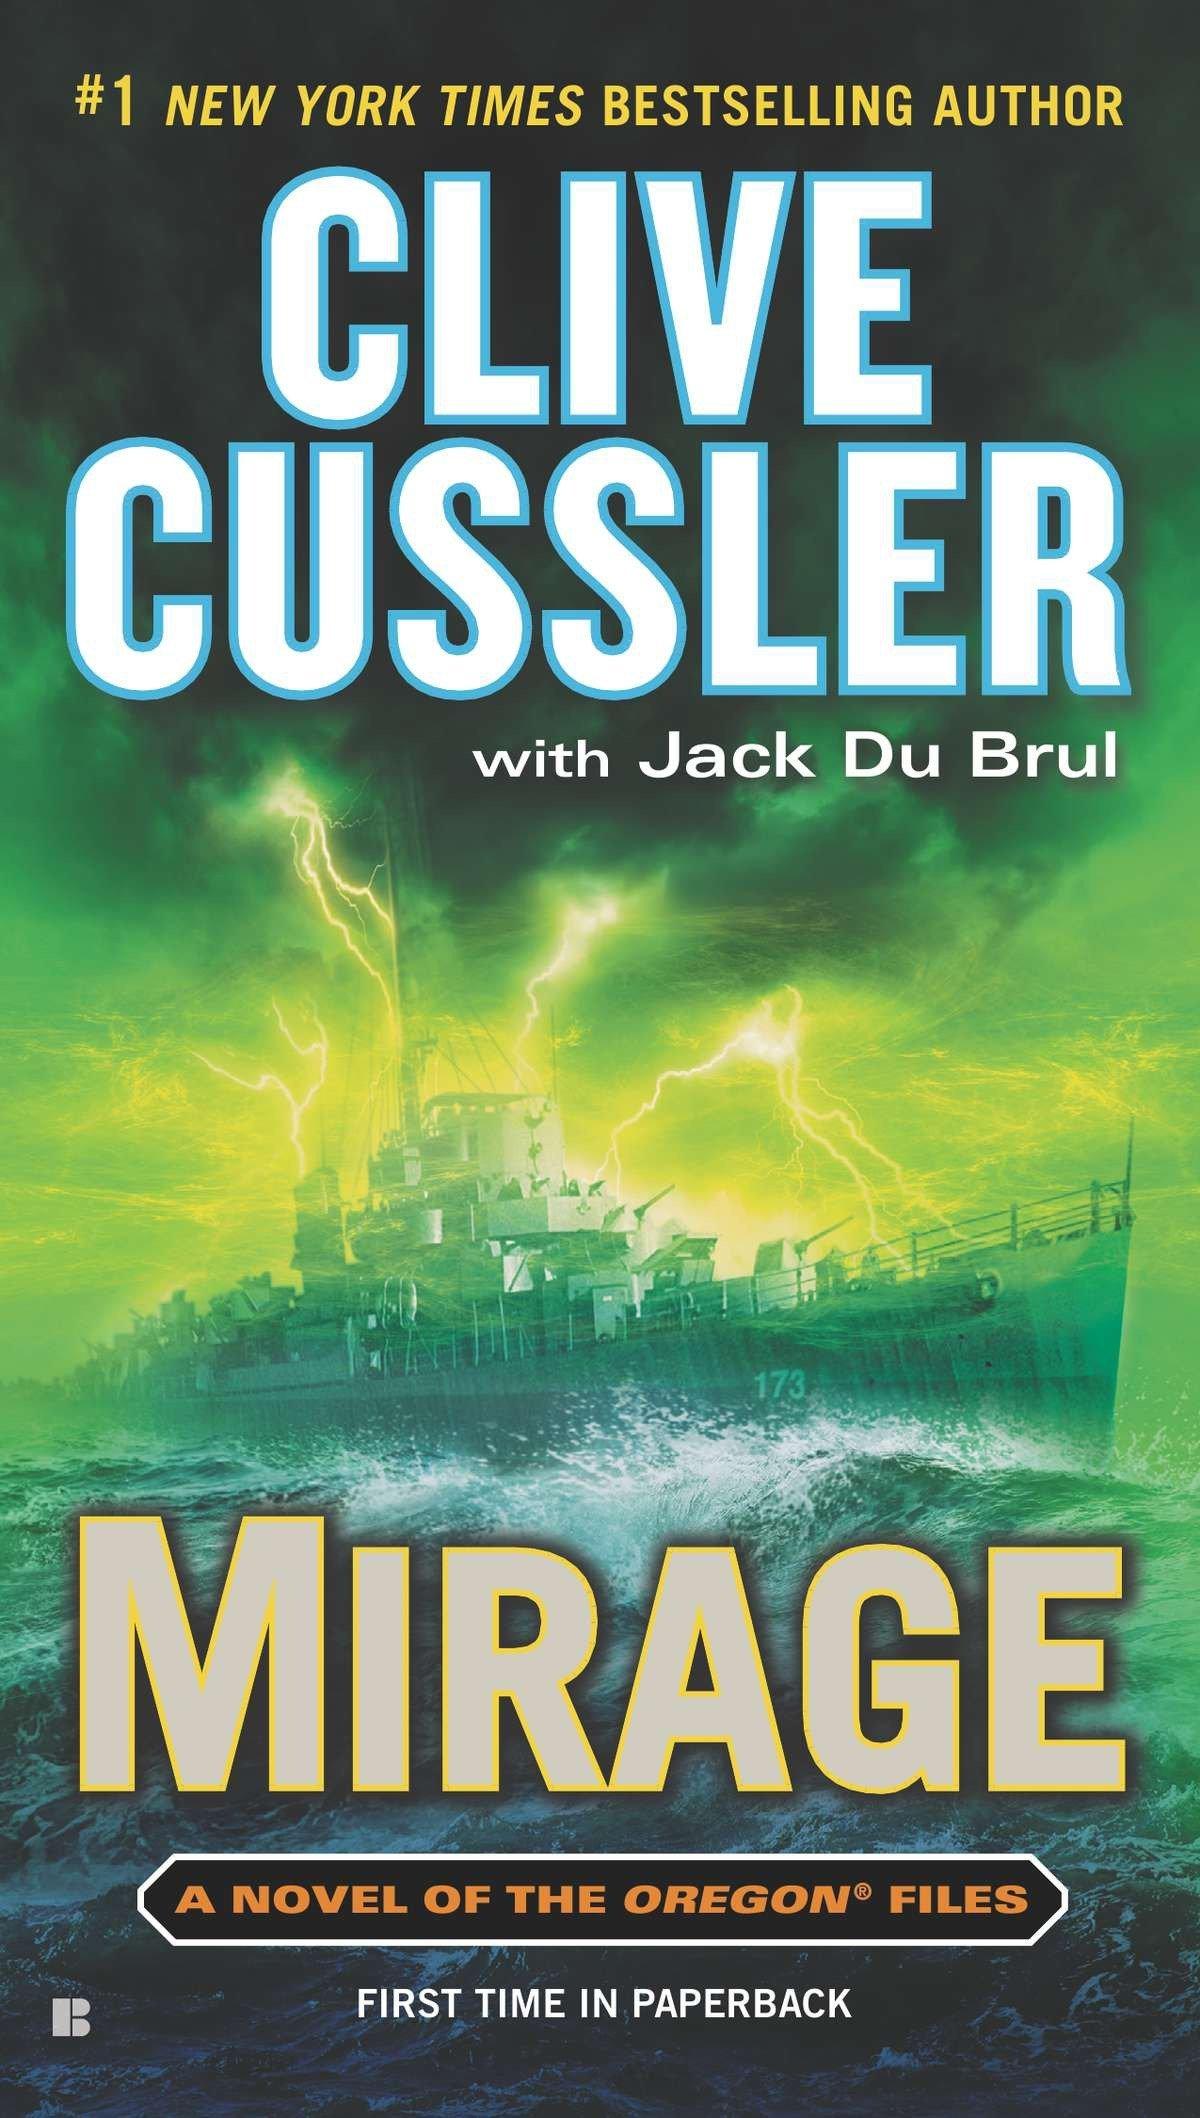 Amazon.com: Mirage (The Oregon Files) (9780425250631): Clive Cussler, Jack  Du Brul: Books